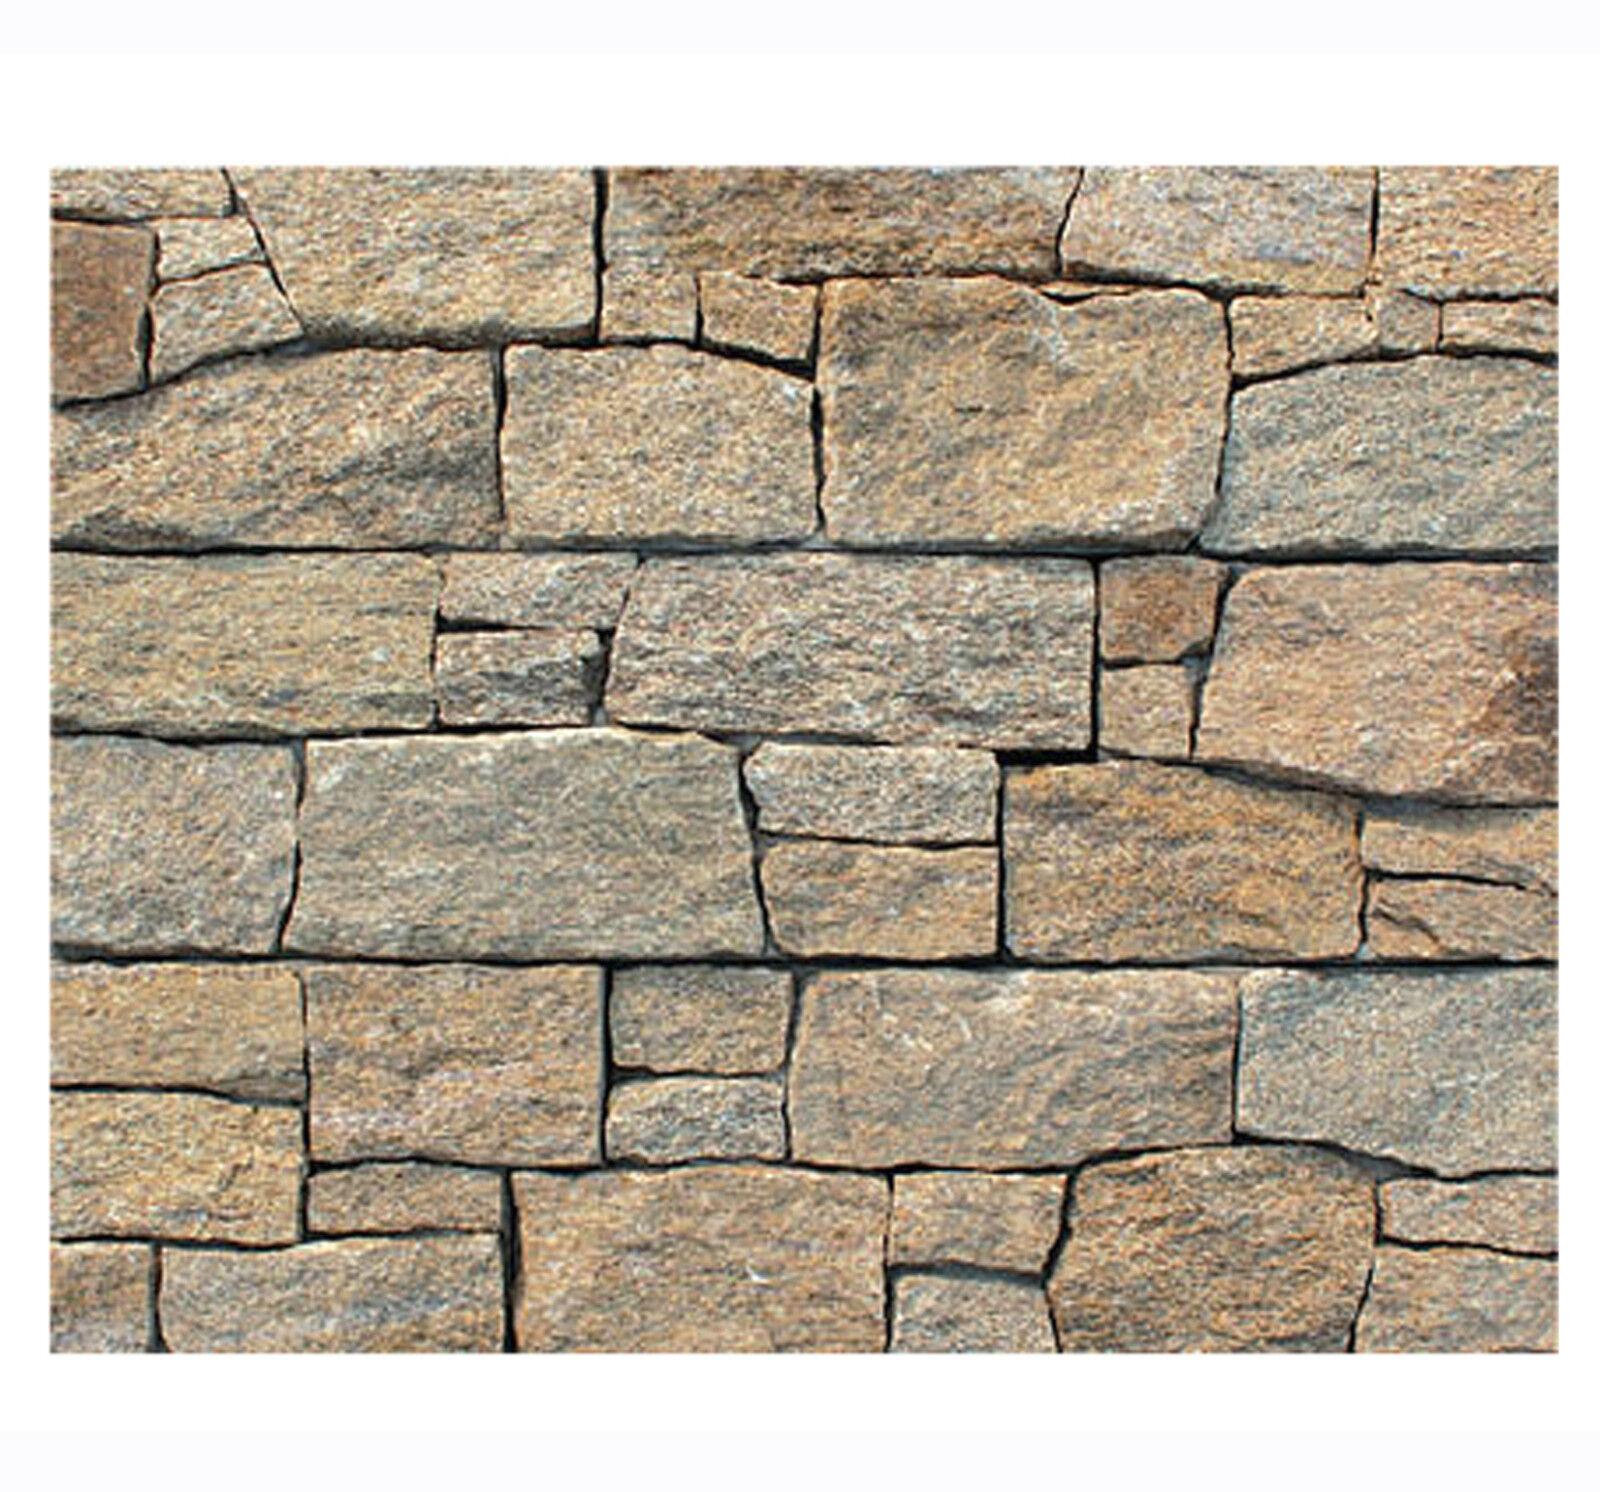 1 qm Granit Wandverblender W-003 - Natursteinwand Wanddesign Wandverkleidung